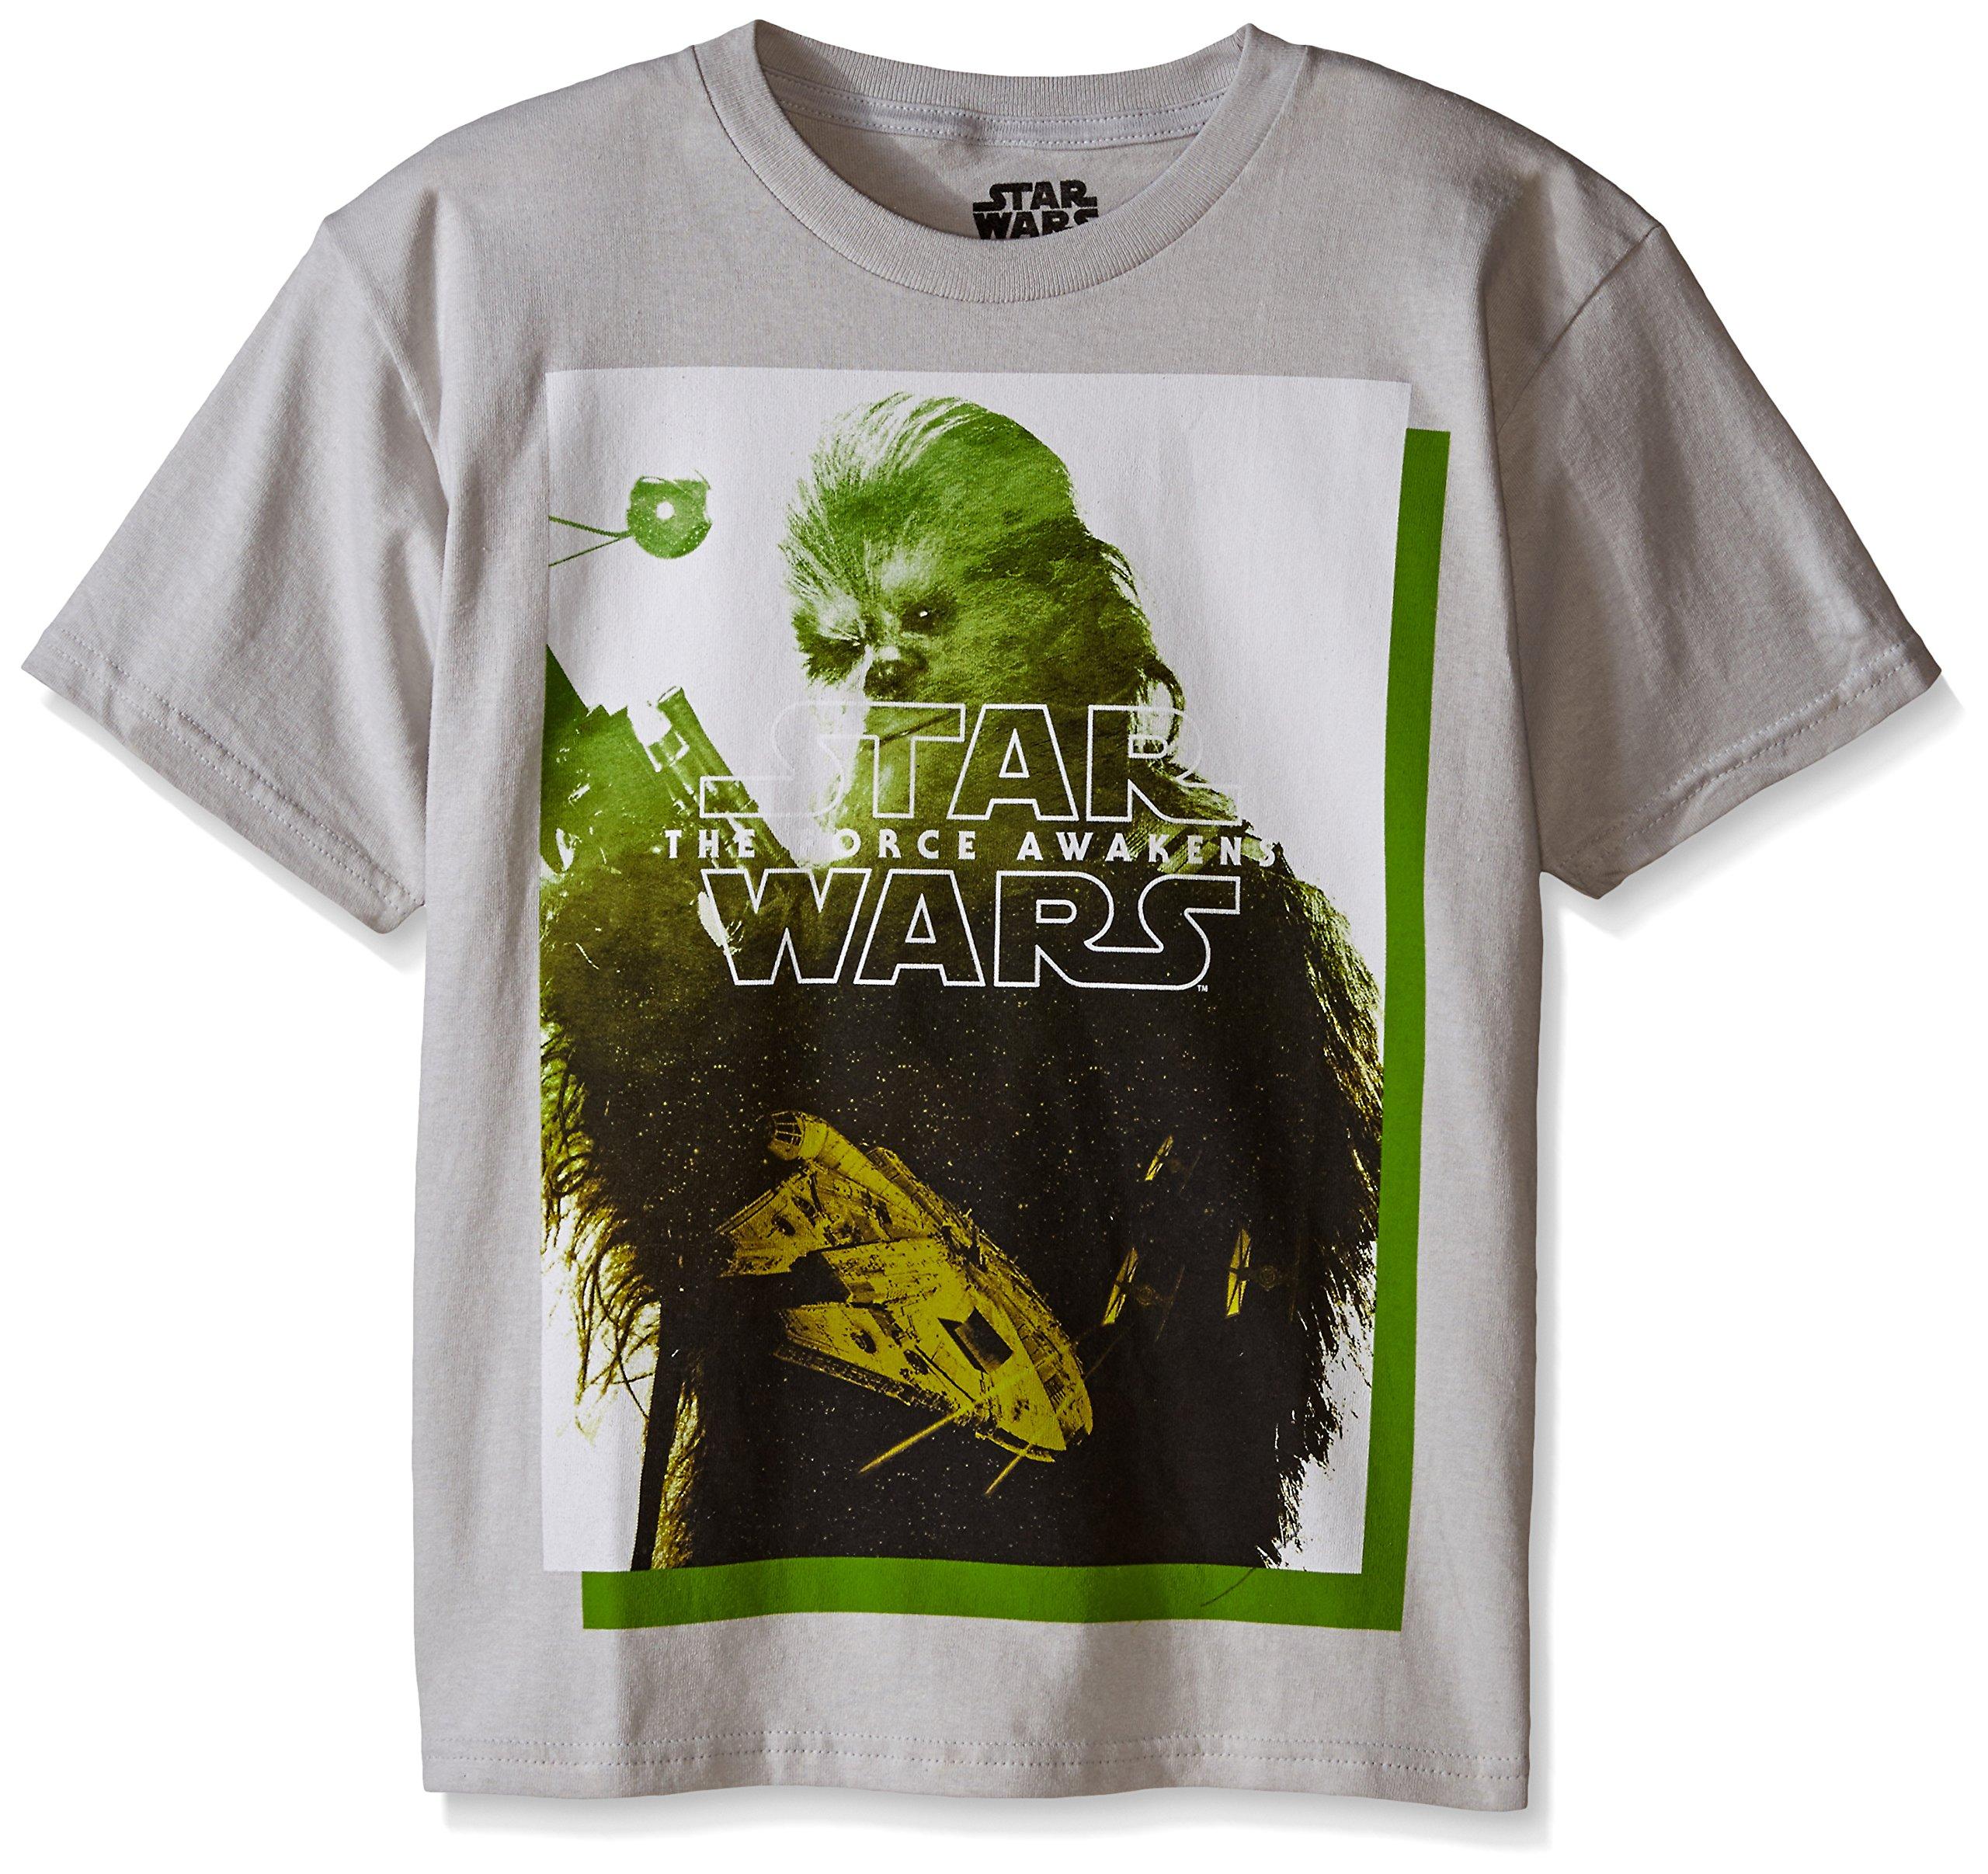 Star Wars Big Boys' T-Shirt, Grey, Large/14-16